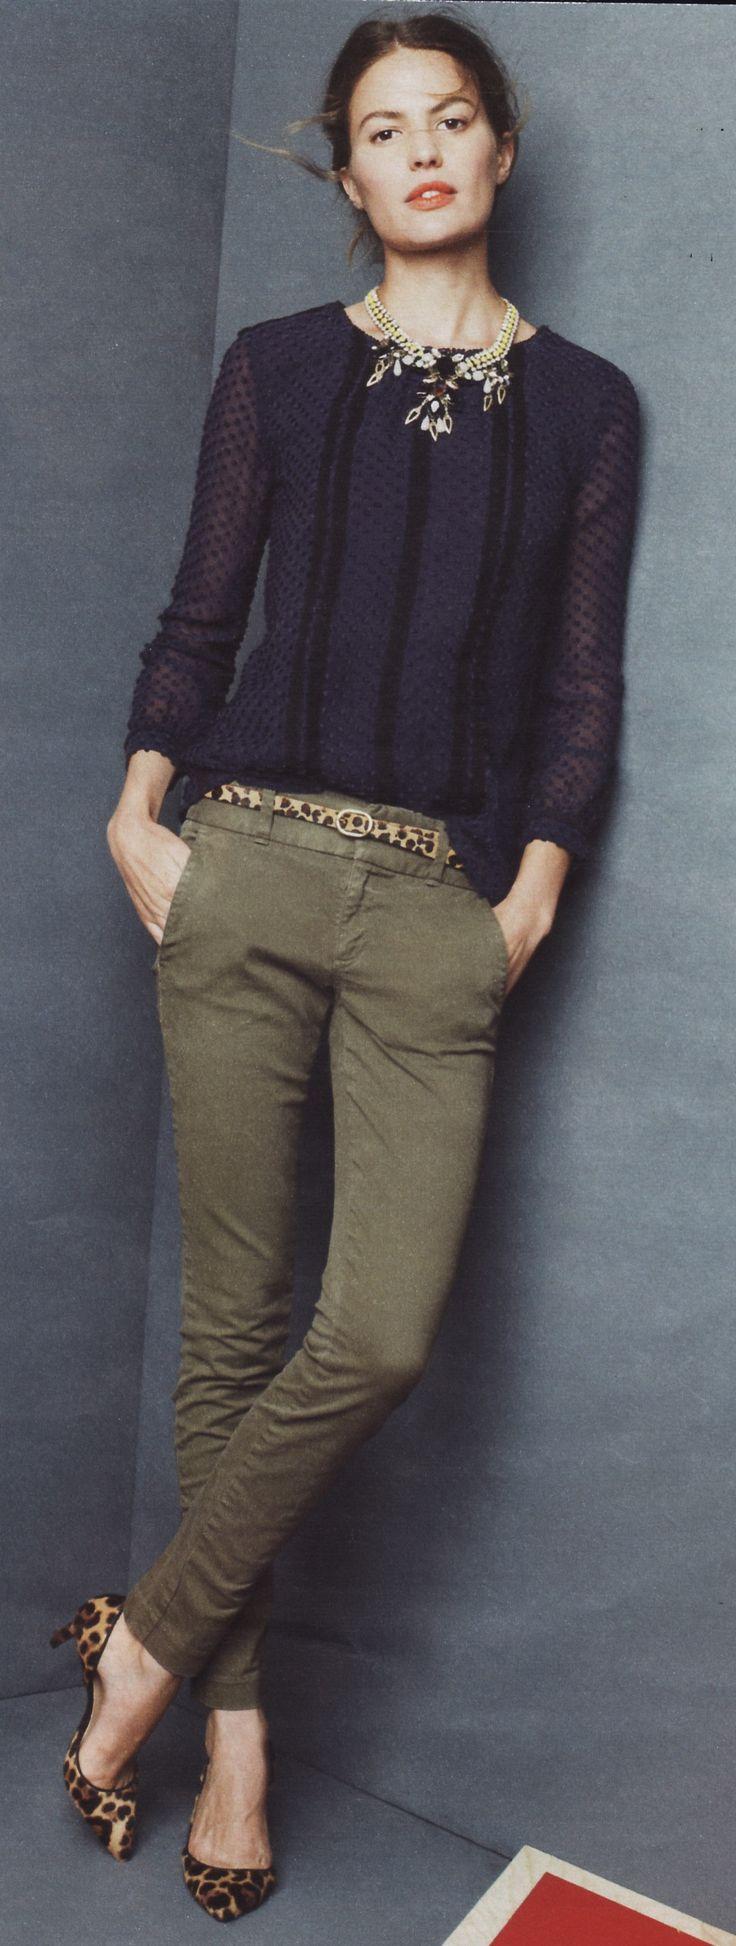 Shear black top, statement necklace, olive pants, patterned pumps